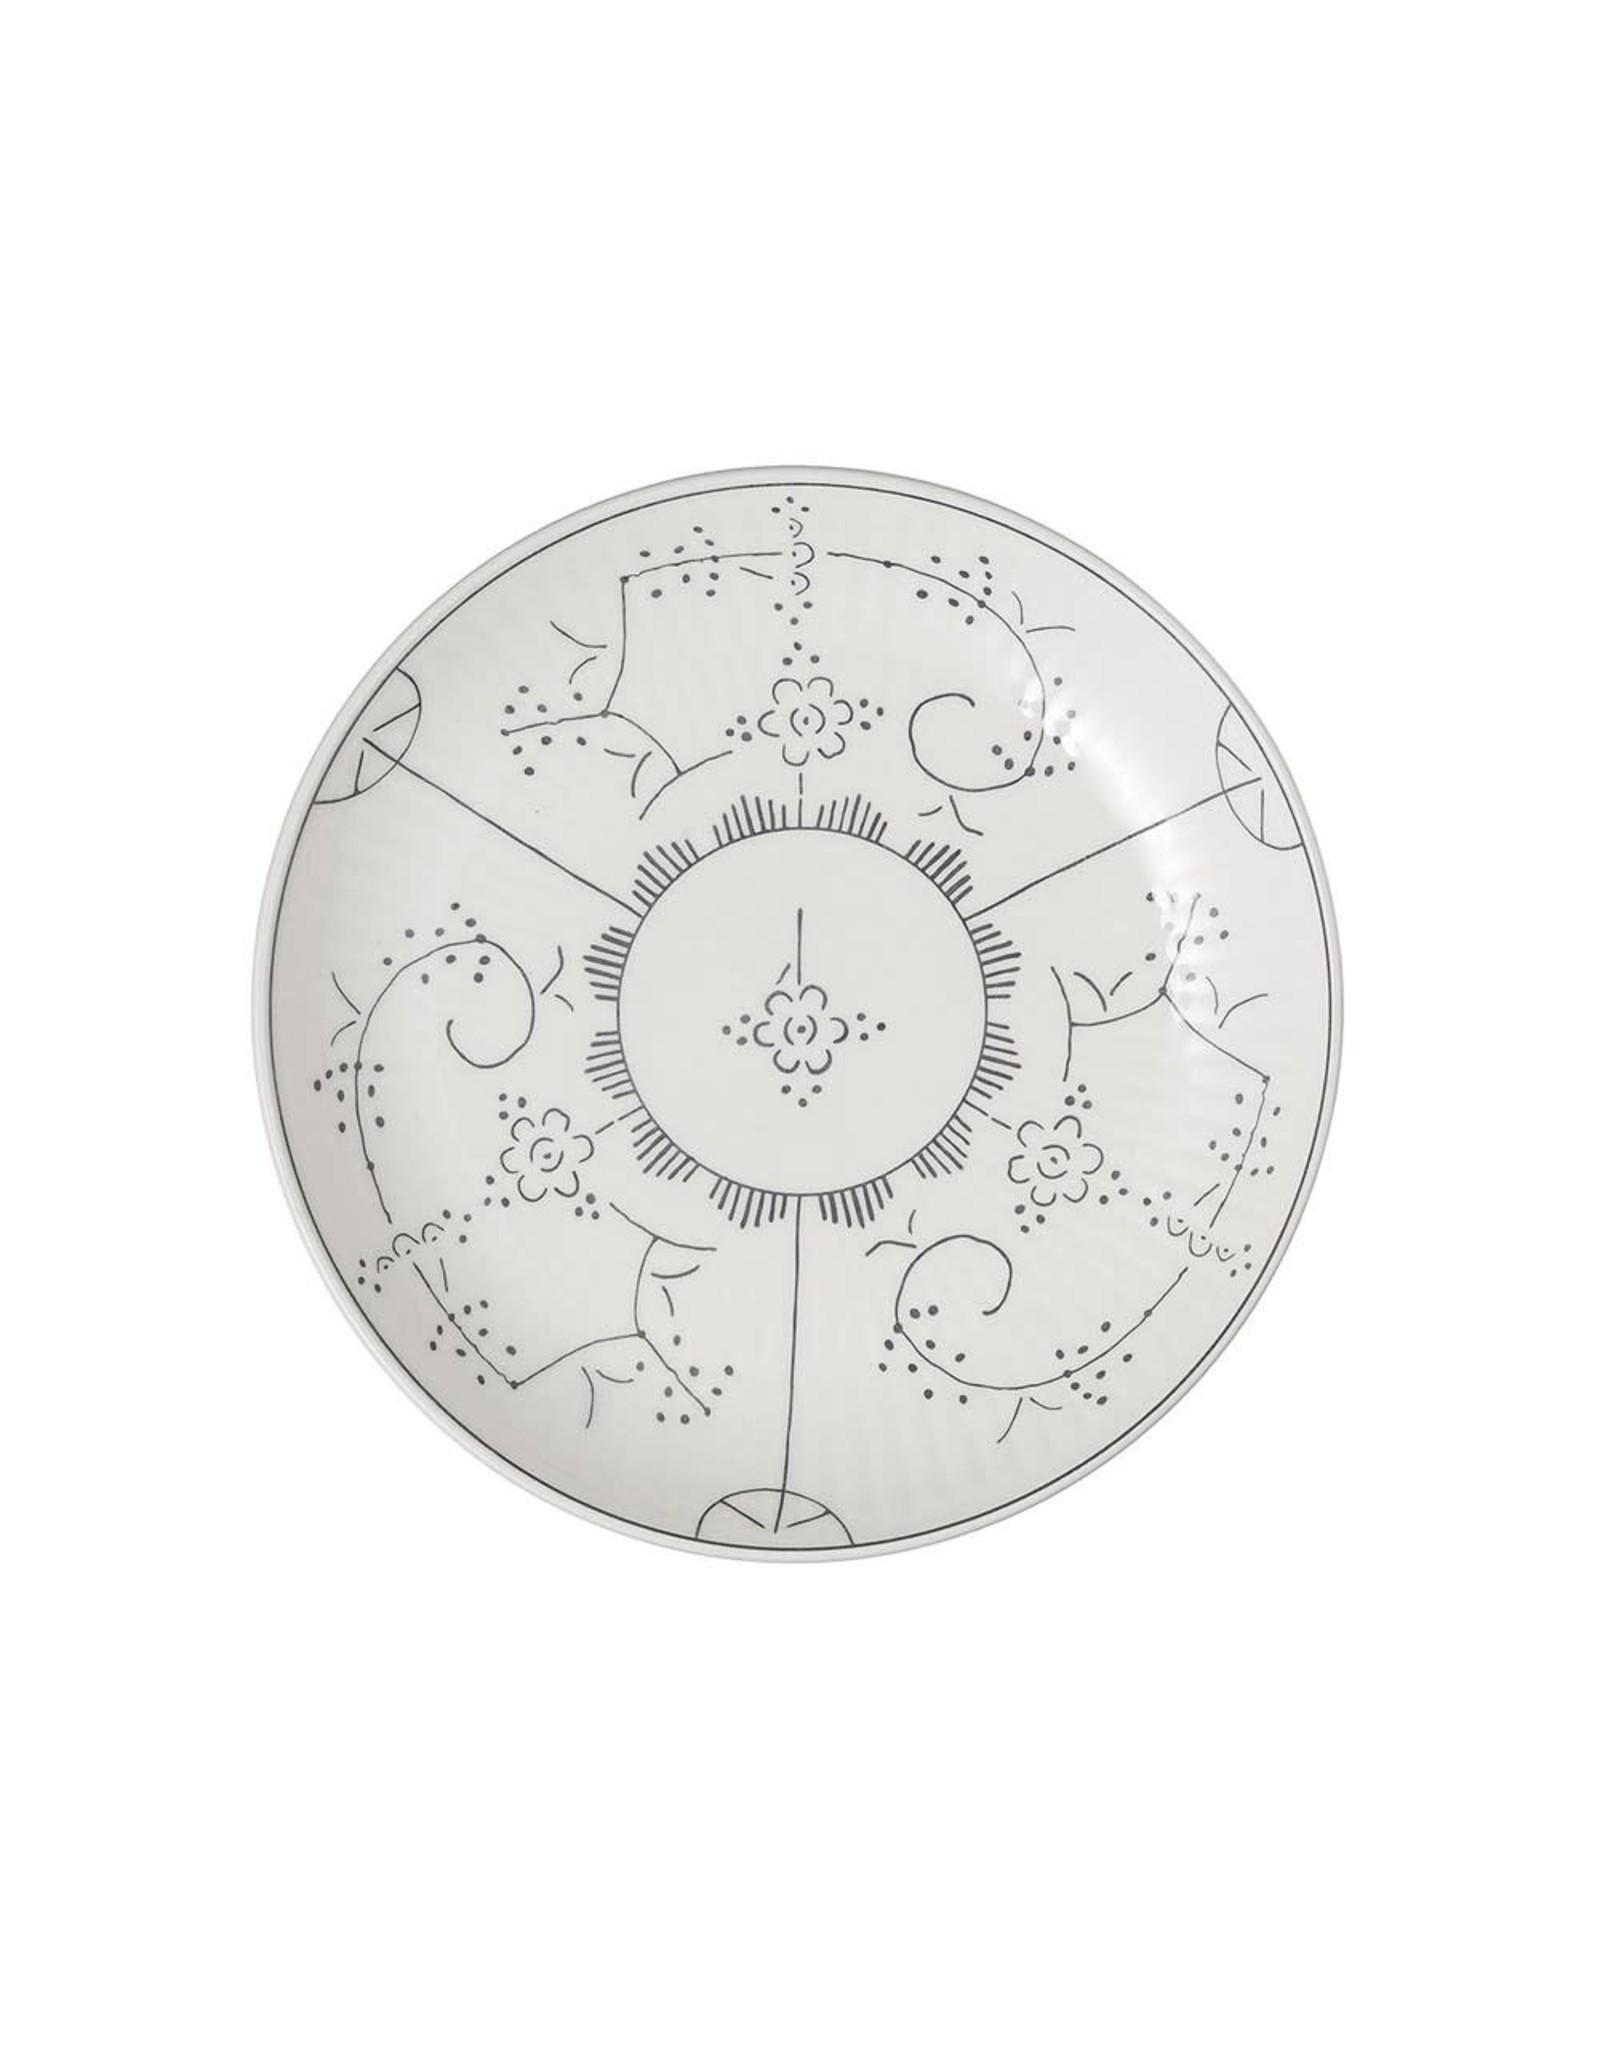 Creative Co-op 8 1/2 Vintage Reproduction Bowl w/Grey Design